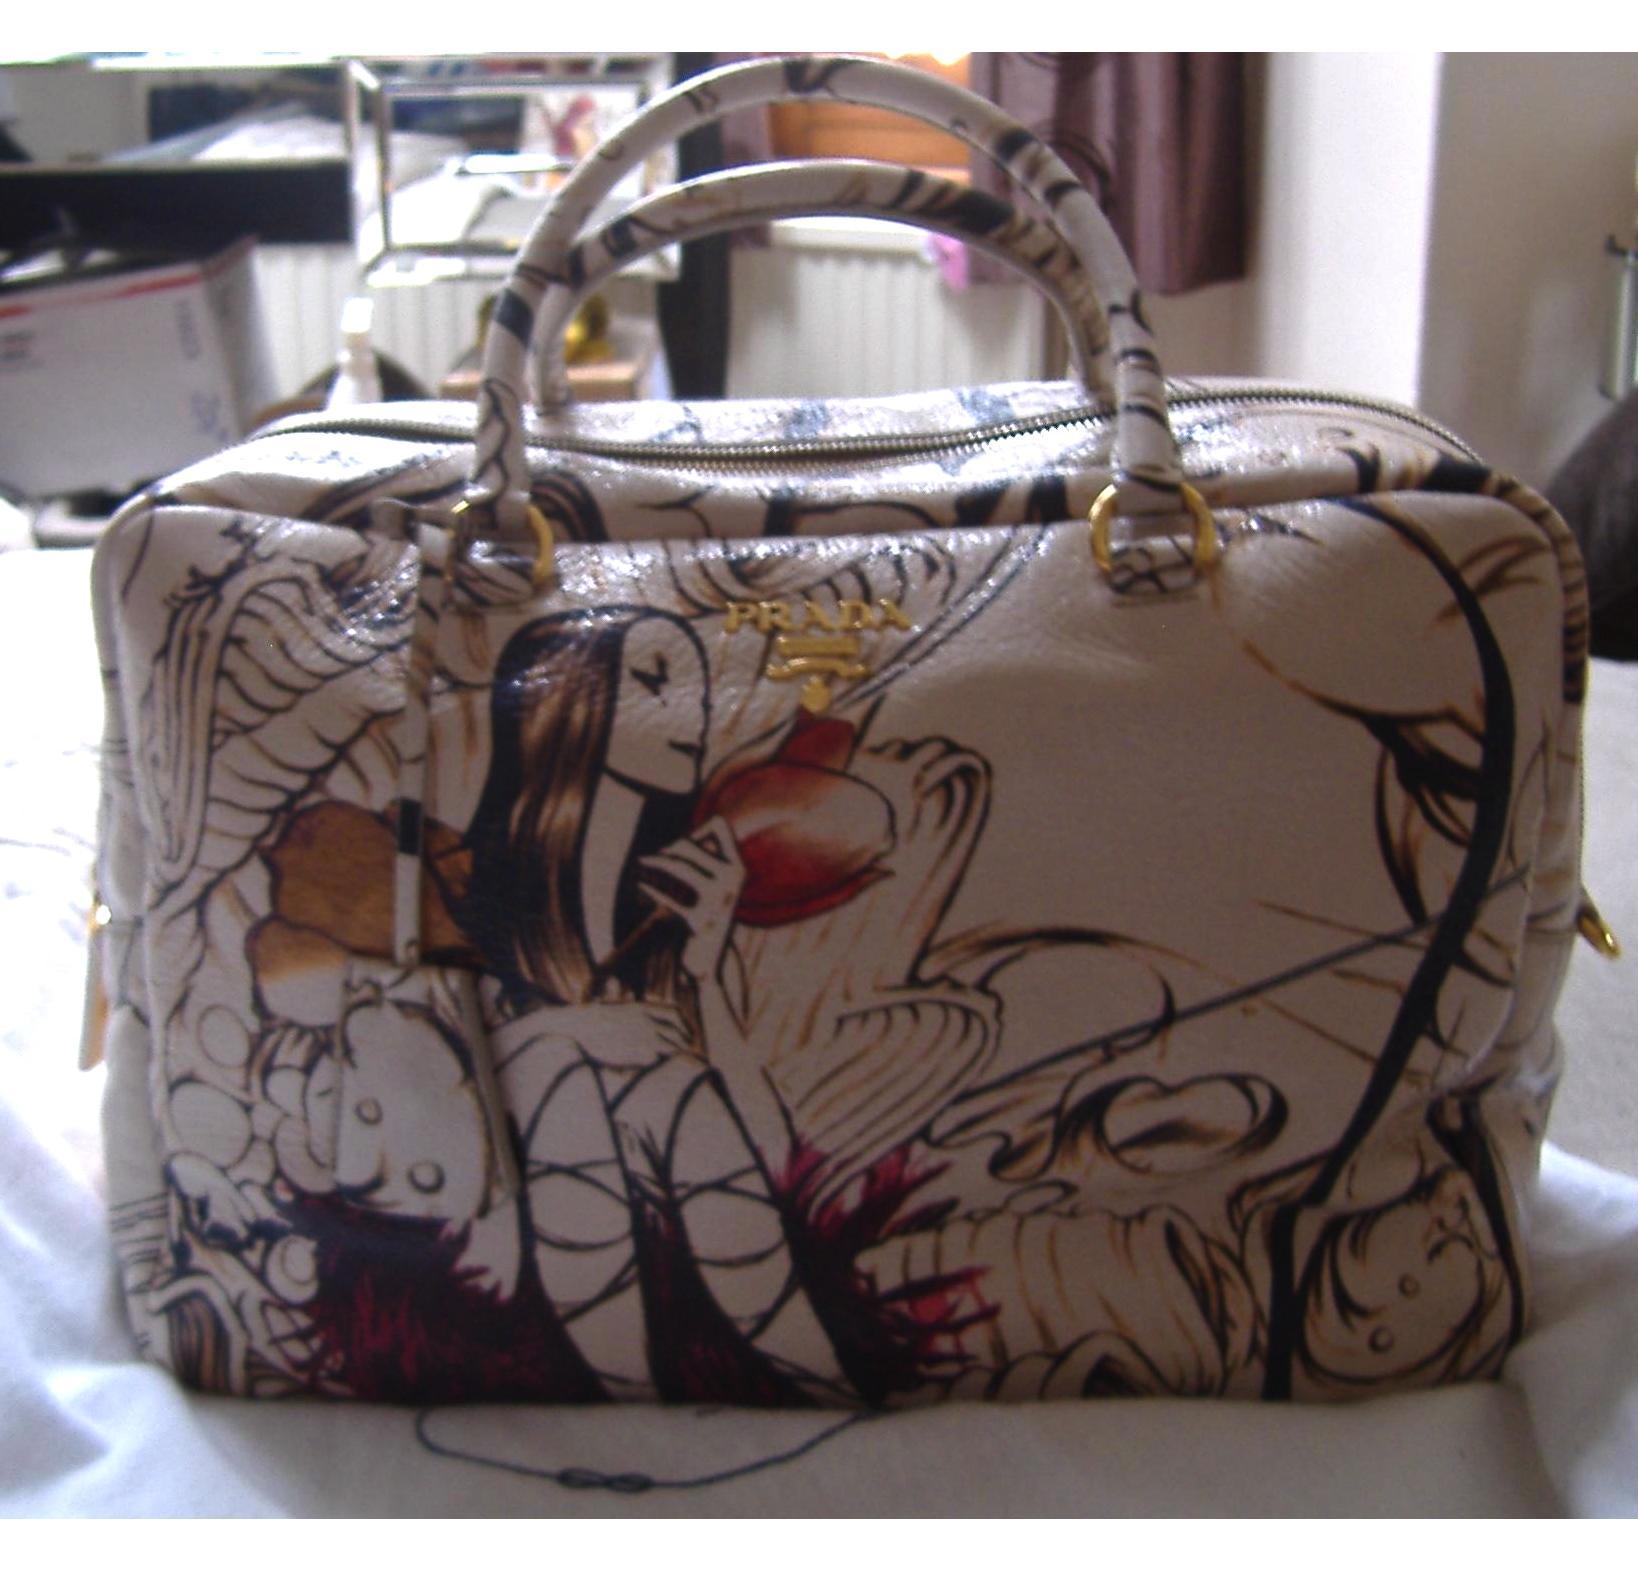 ... sweden prada fairy bag hewi london 6db51 75b0d f02e025a375ef